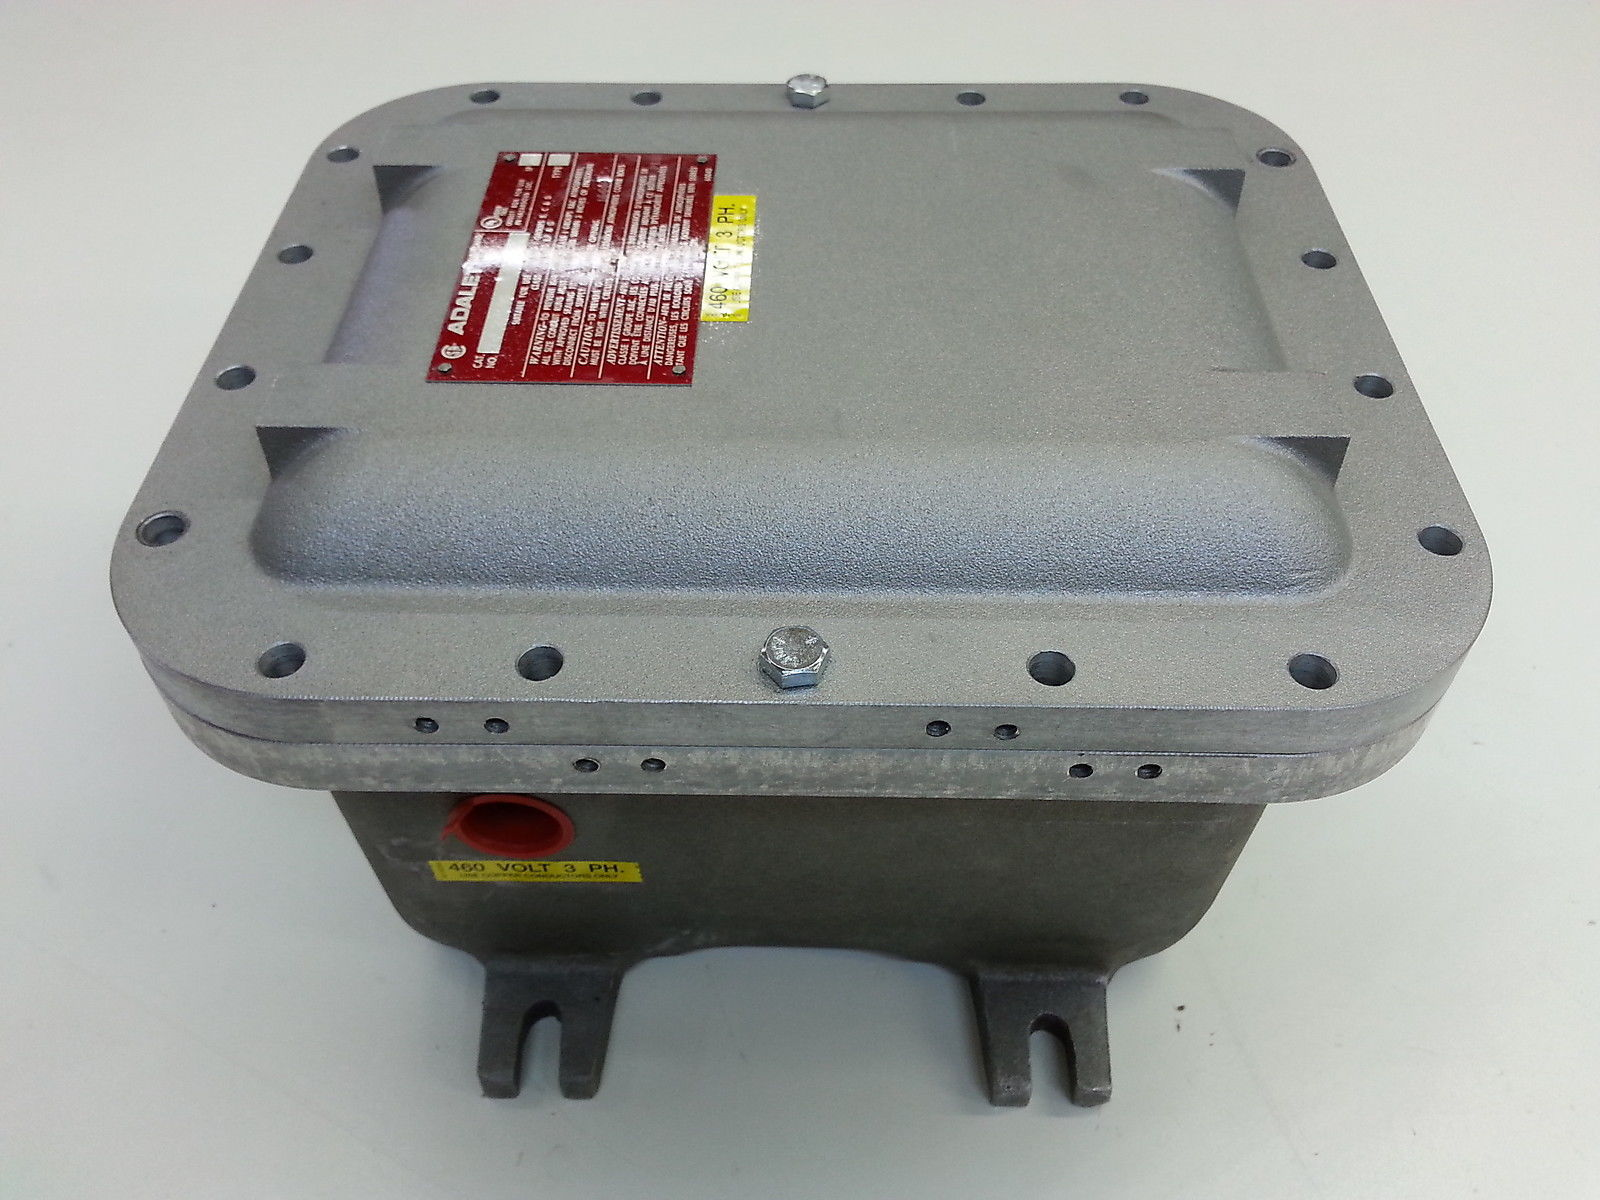 Adalet Xjf 081006 Explosion Proof Motor Starter 460v 3